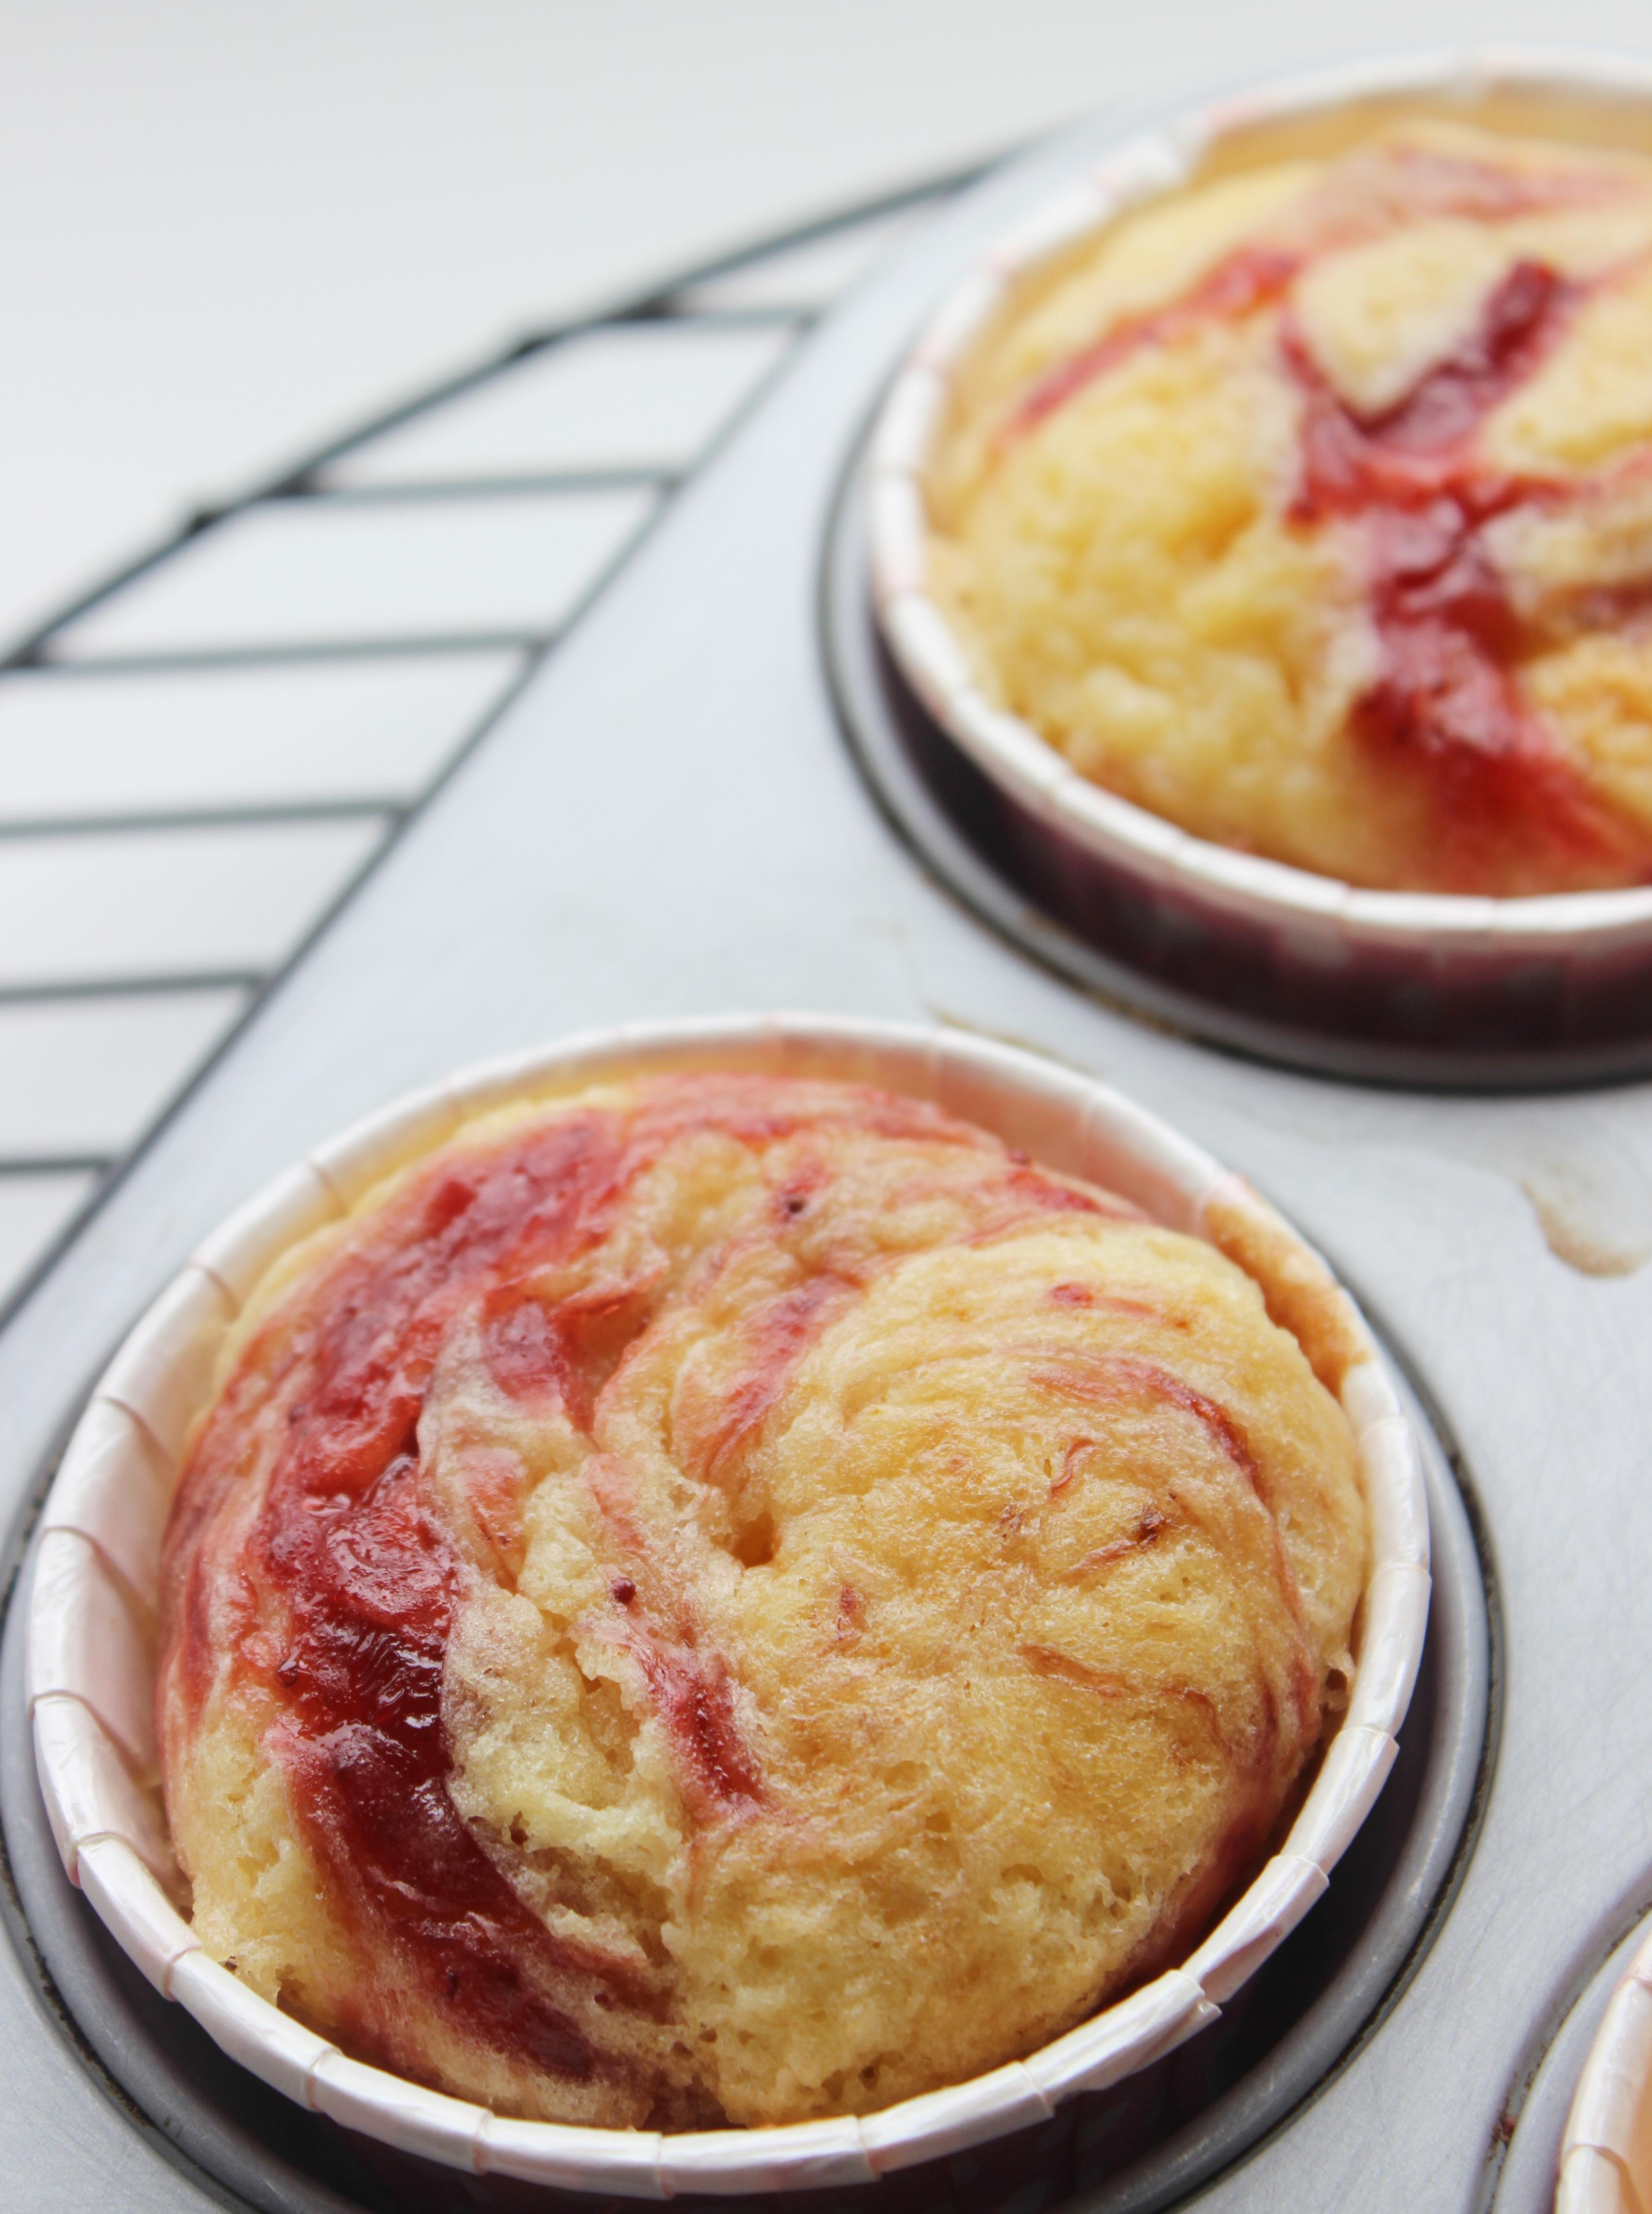 Vanilla Buttermilk Cupcakes with strawberry preserve swirl